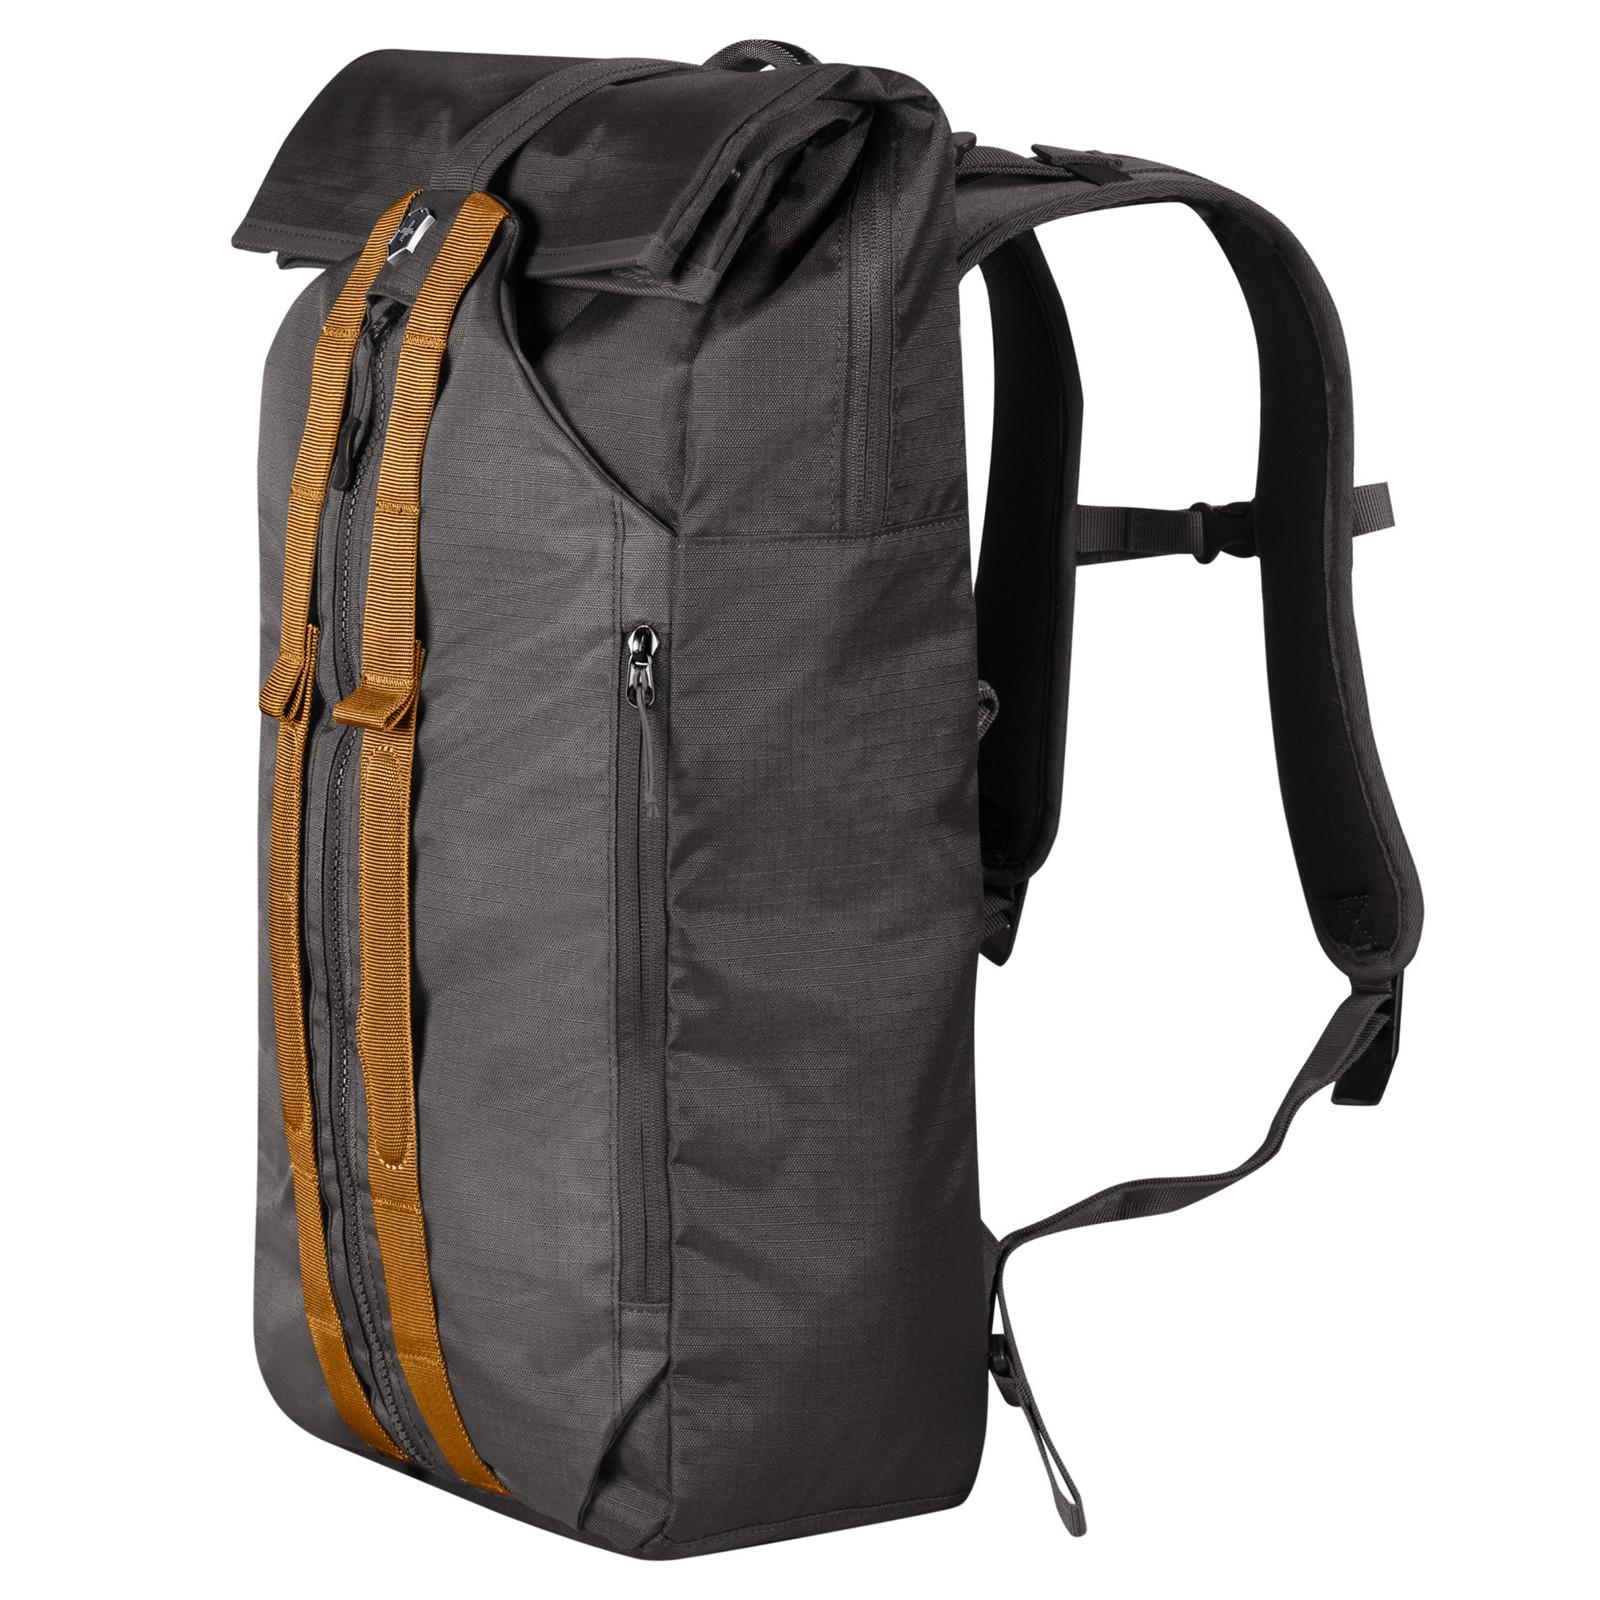 Victorinox Altmont Deluxe rygsække